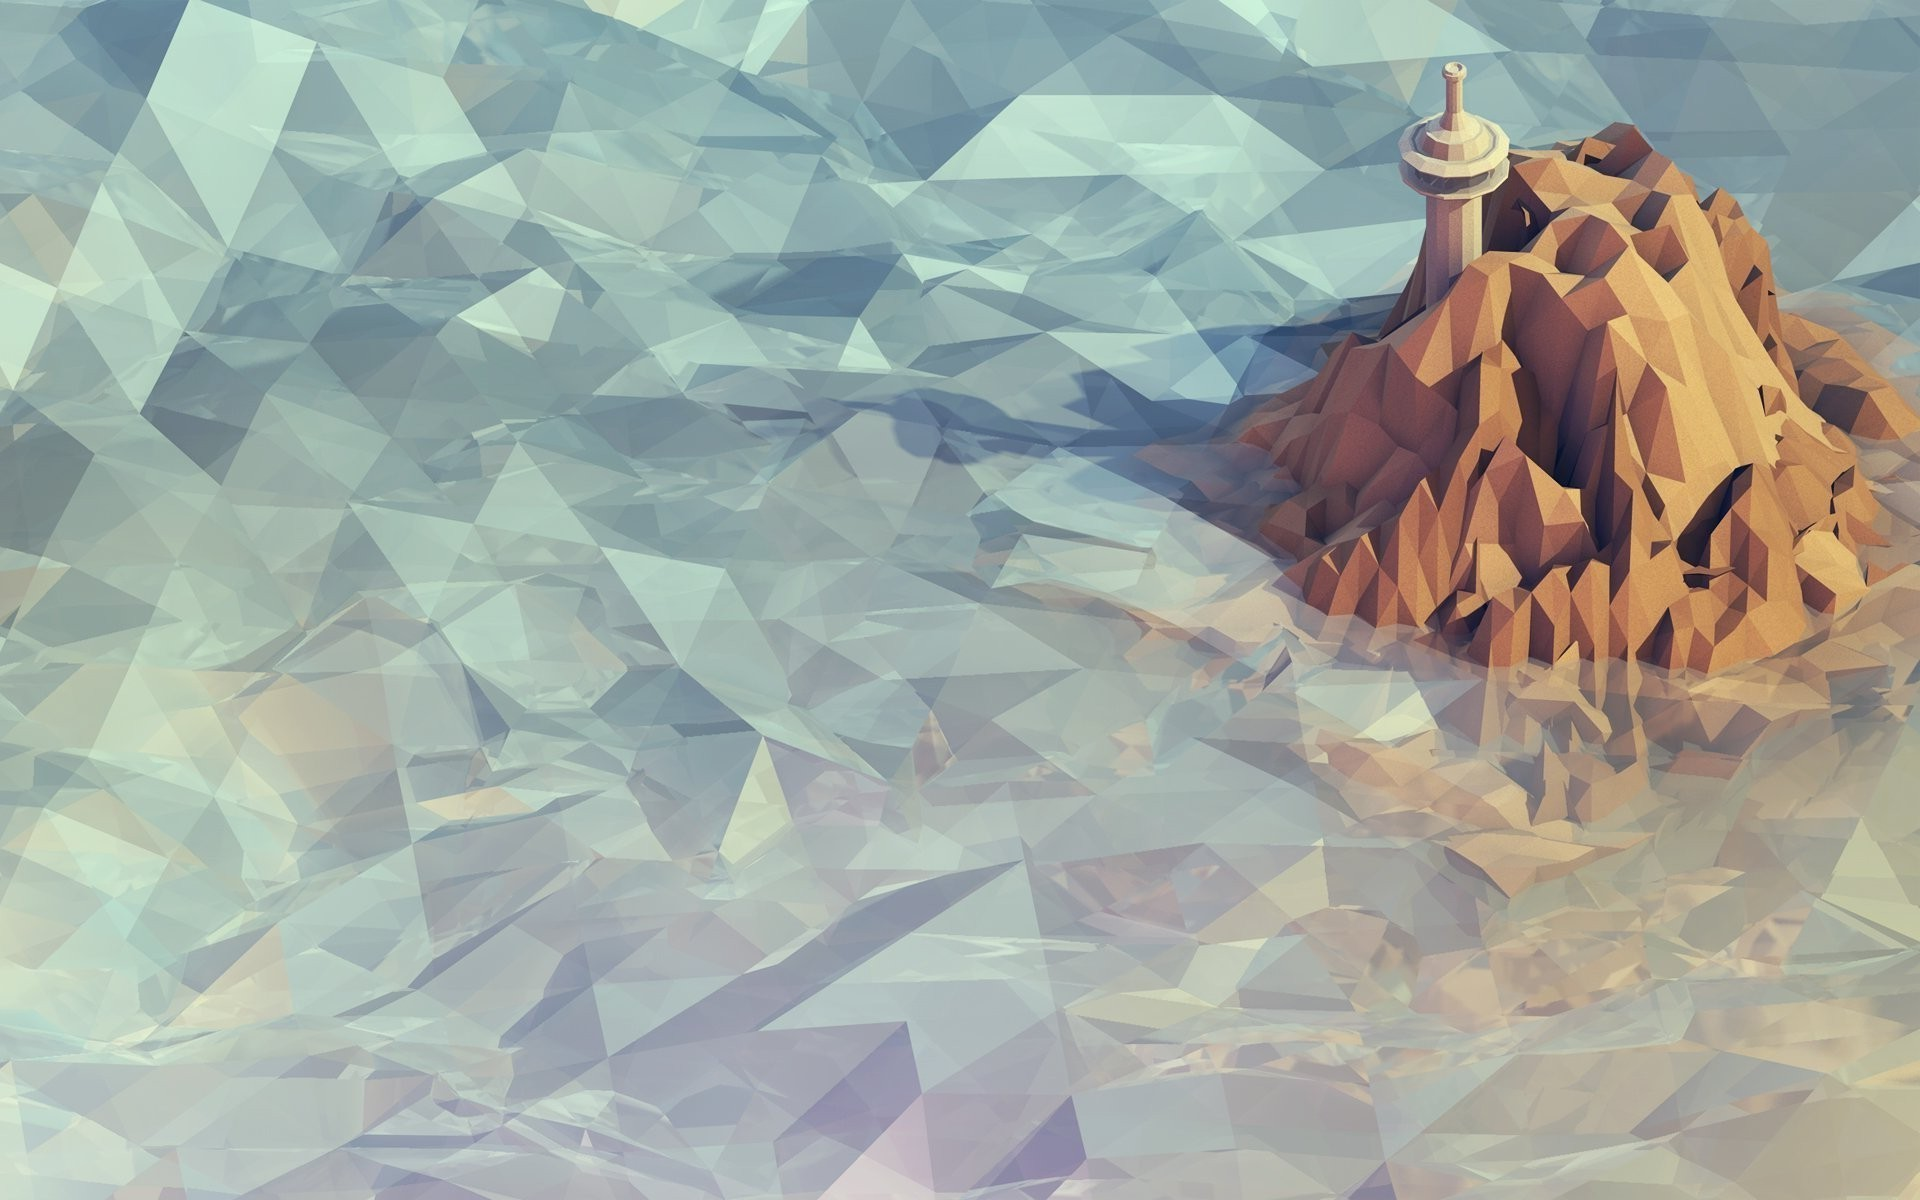 2560×1600 Polygon Art Abstract Mountains Trees Landscape Path Trail HD  Wallpaper | polygon art | Pinterest | Polygon art, Low poly and Hd wallpaper